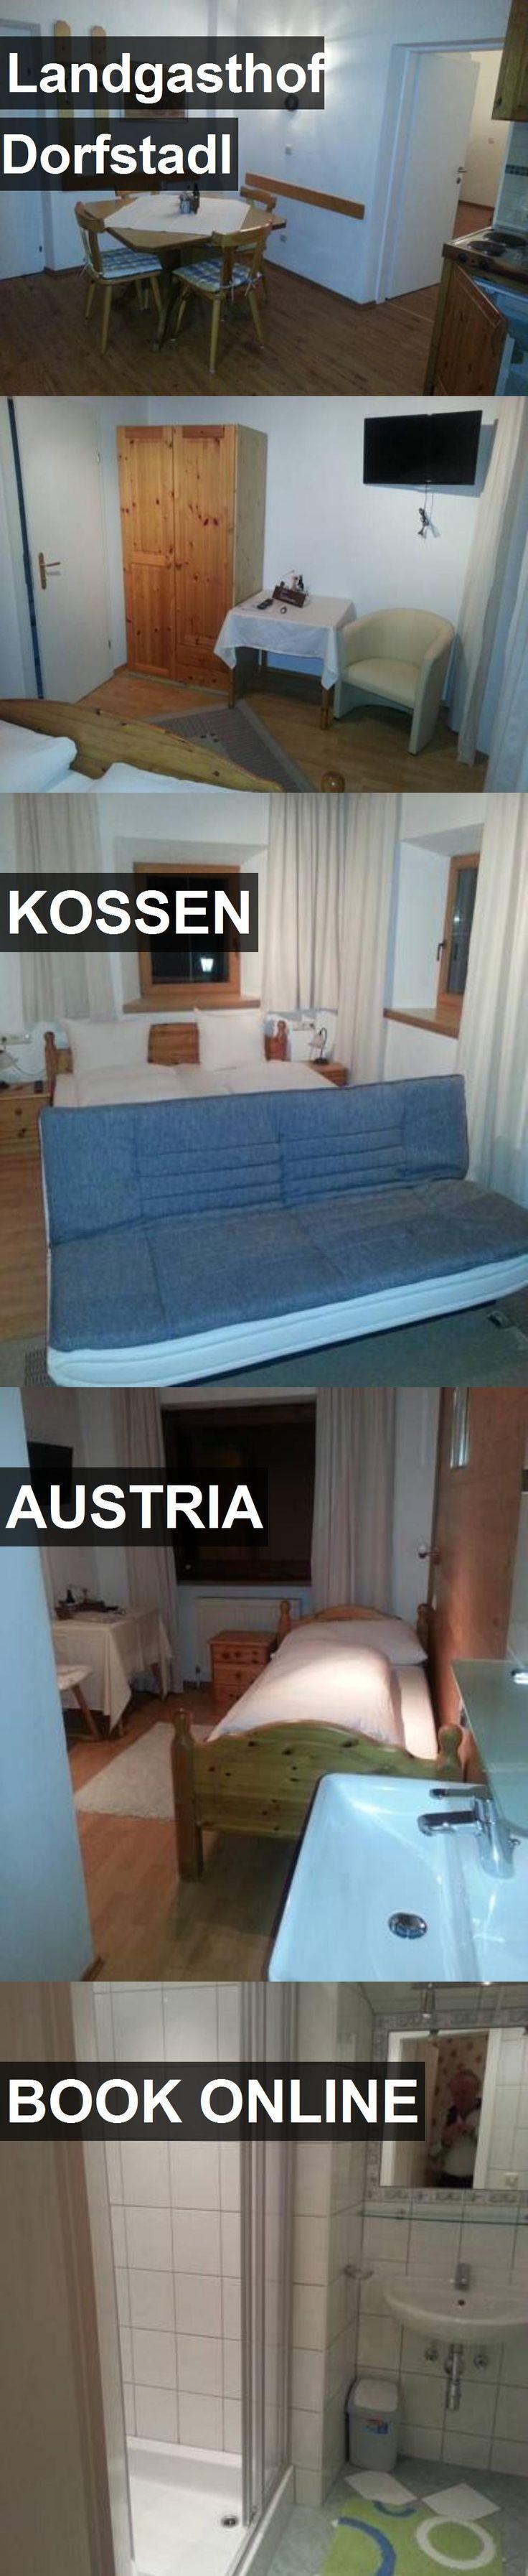 Hotel Landgasthof Dorfstadl in Kossen, Austria. For more information, photos, reviews and best prices please follow the link. #Austria #Kossen #travel #vacation #hotel